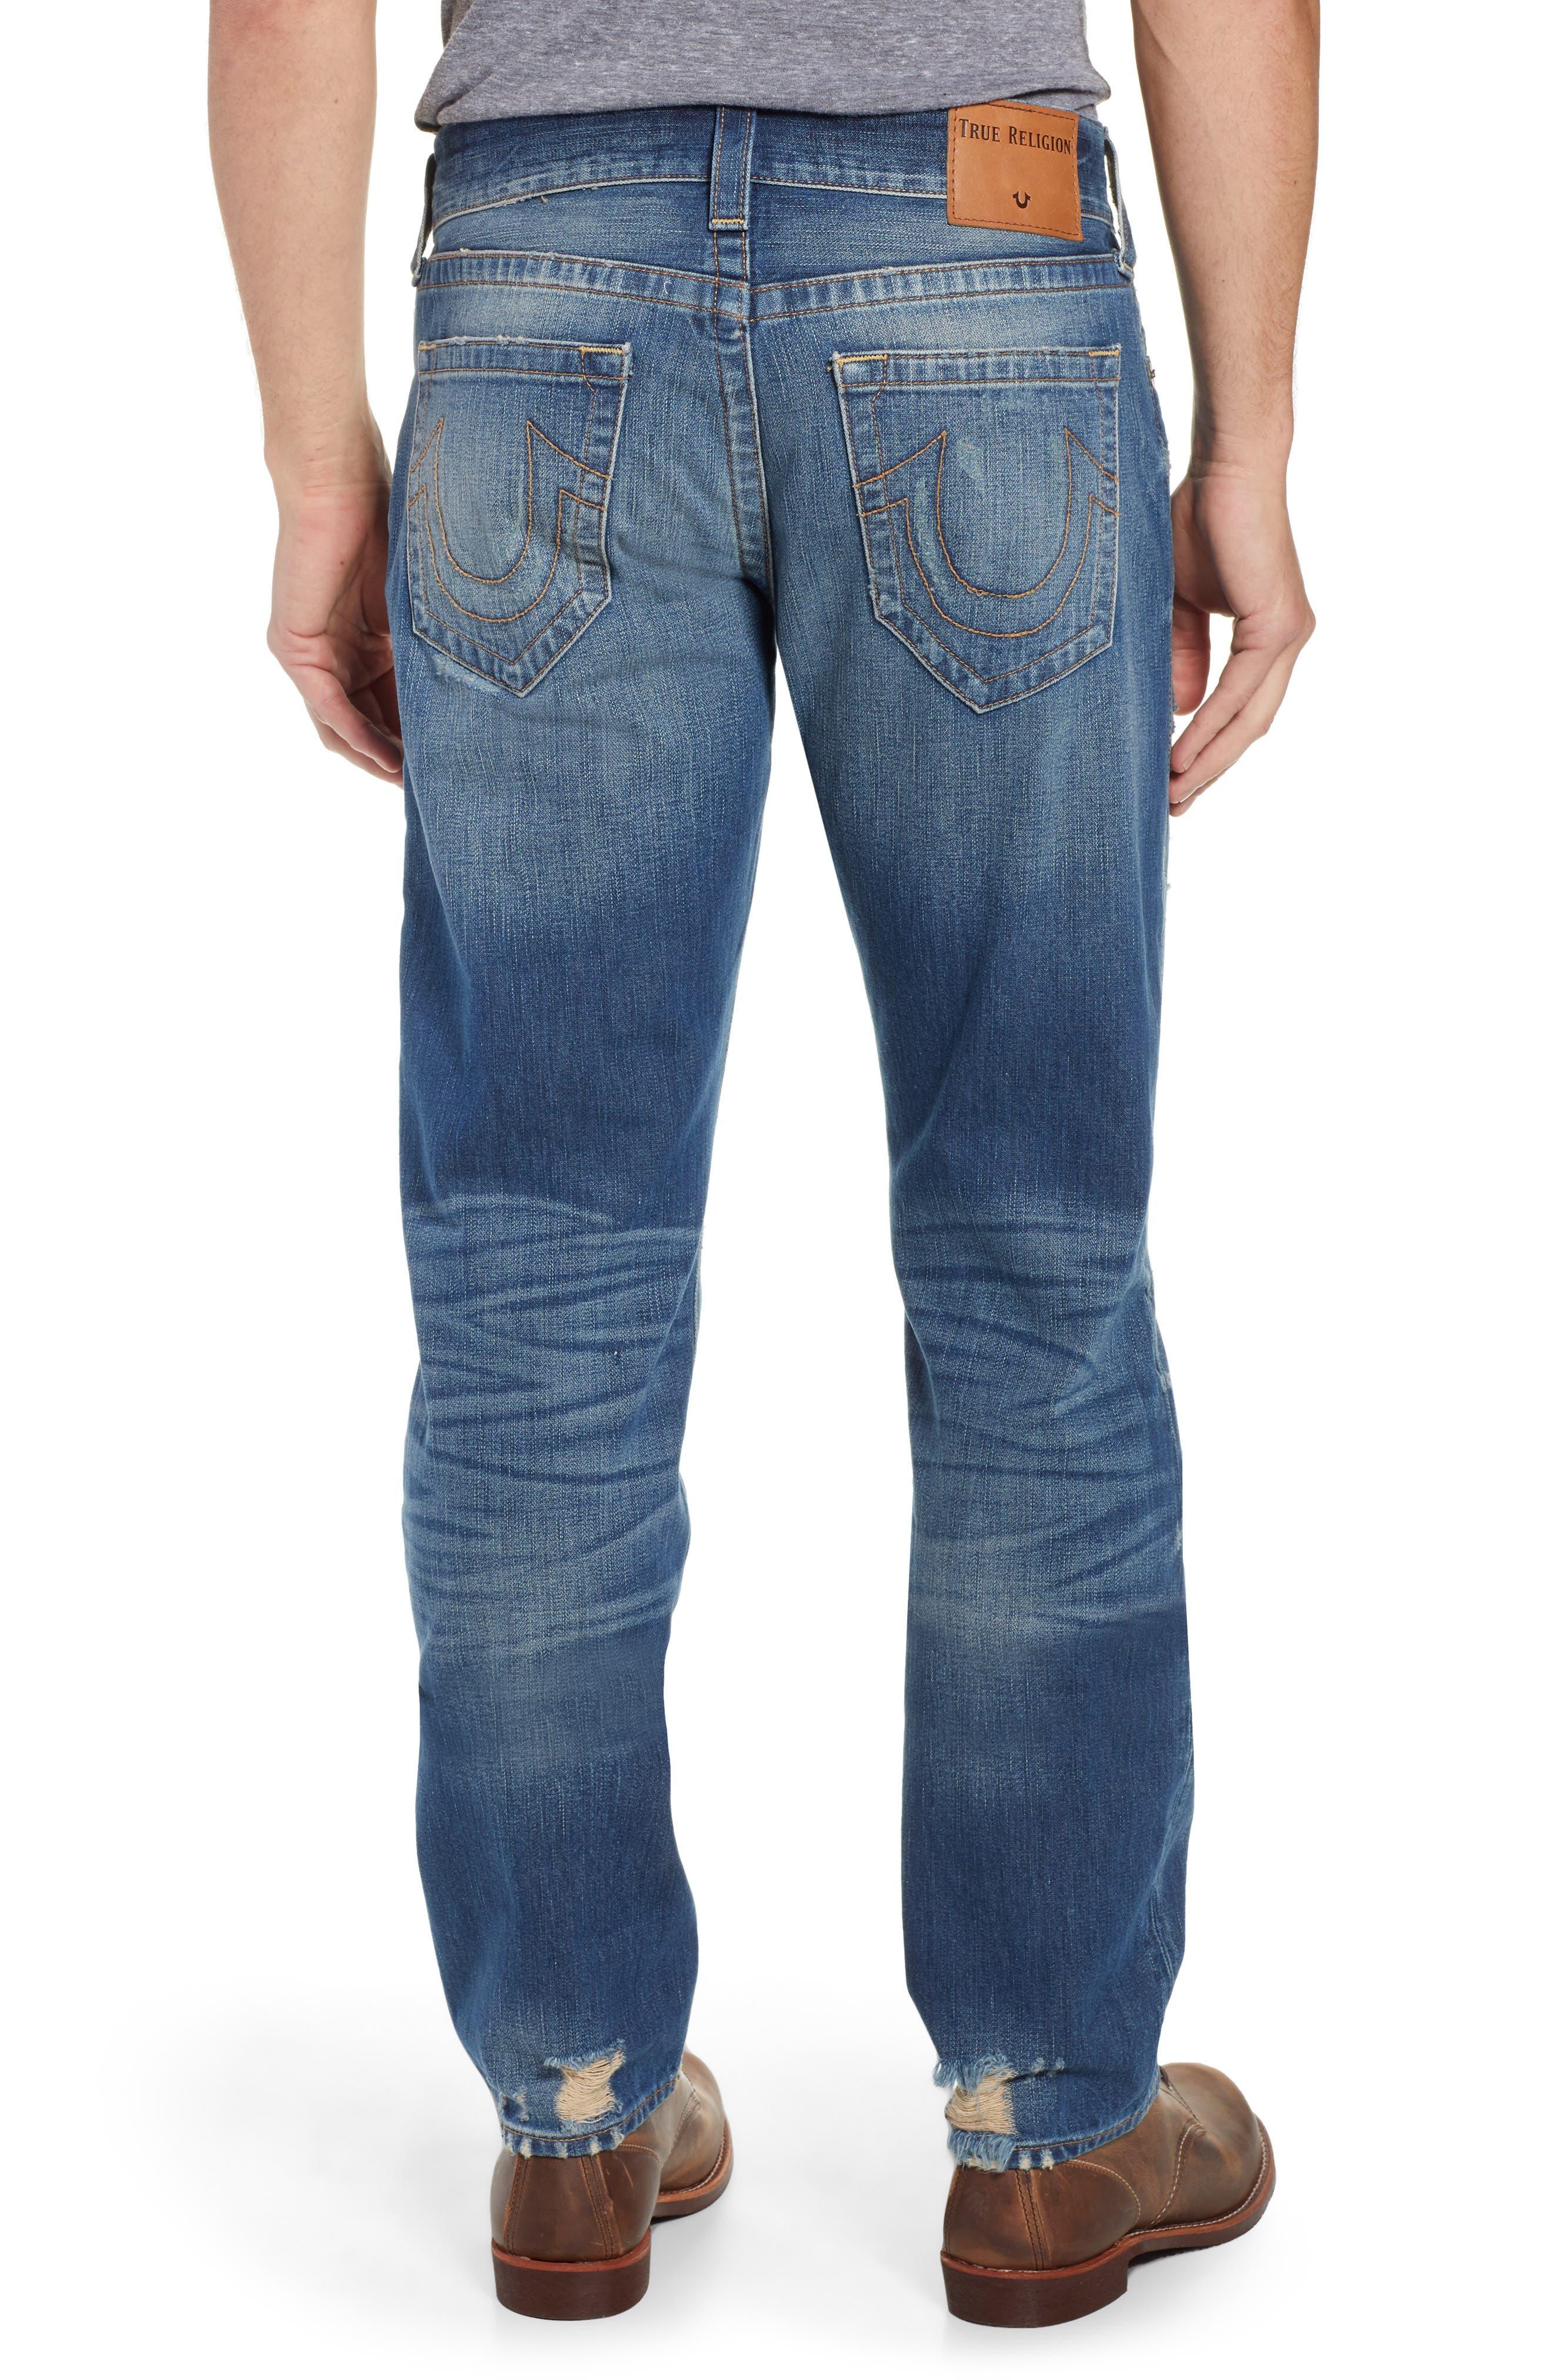 TRUE RELIGION BRAND JEANS,                             Geno Straight Leg Jeans,                             Alternate thumbnail 2, color,                             WORN REBEL